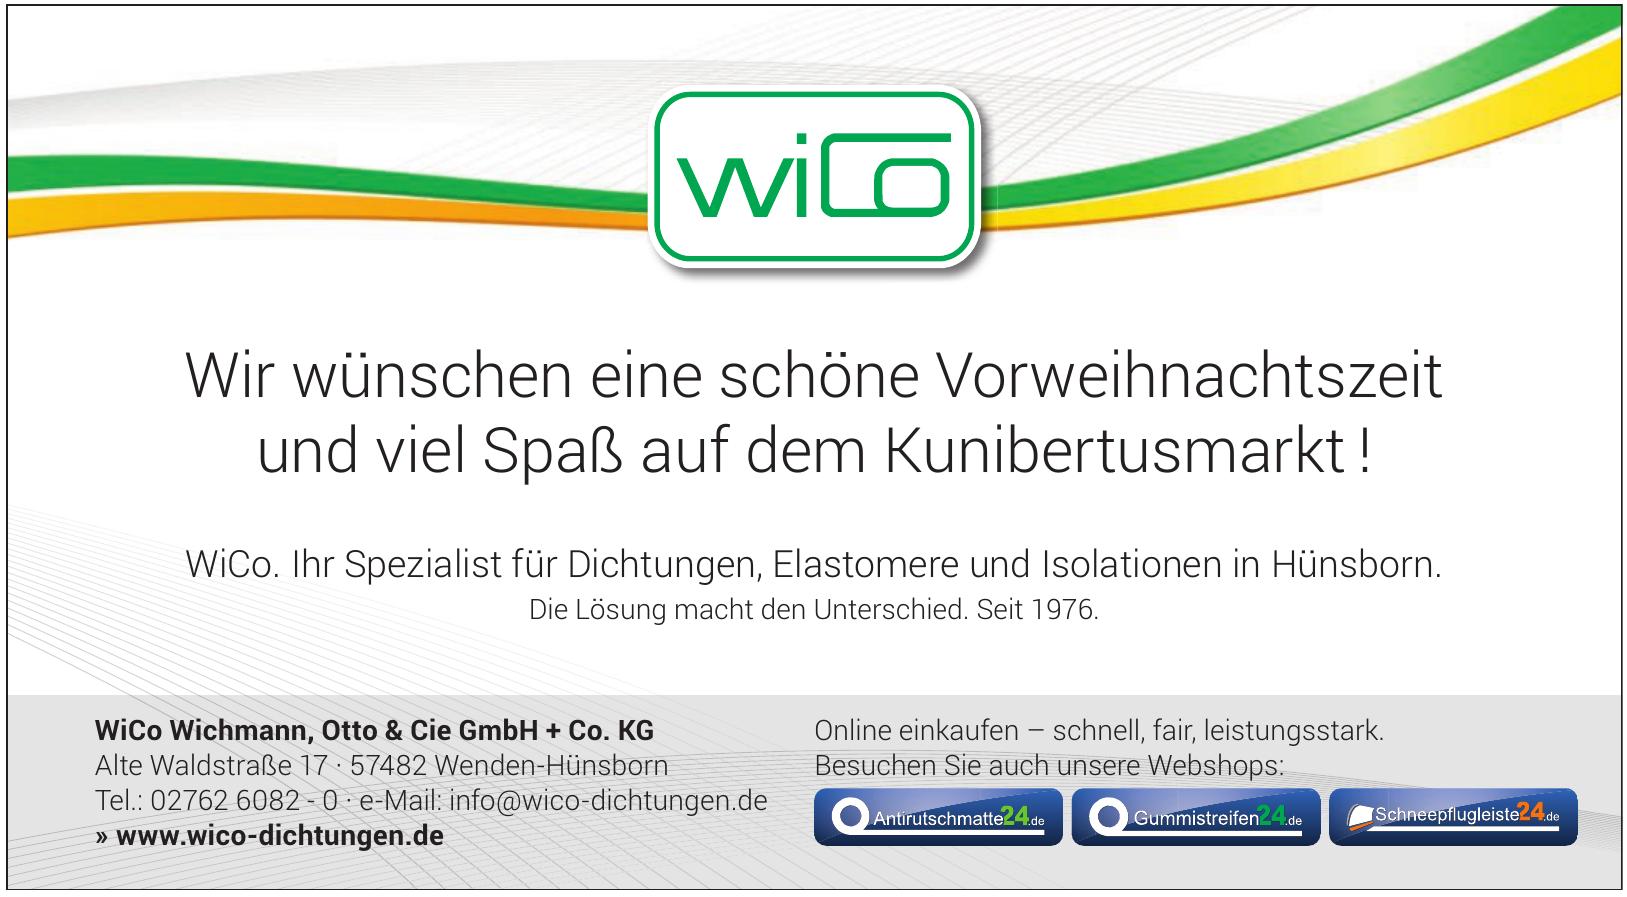 WiCo Wichmann, Otto & Cie GmbH+Co. KG